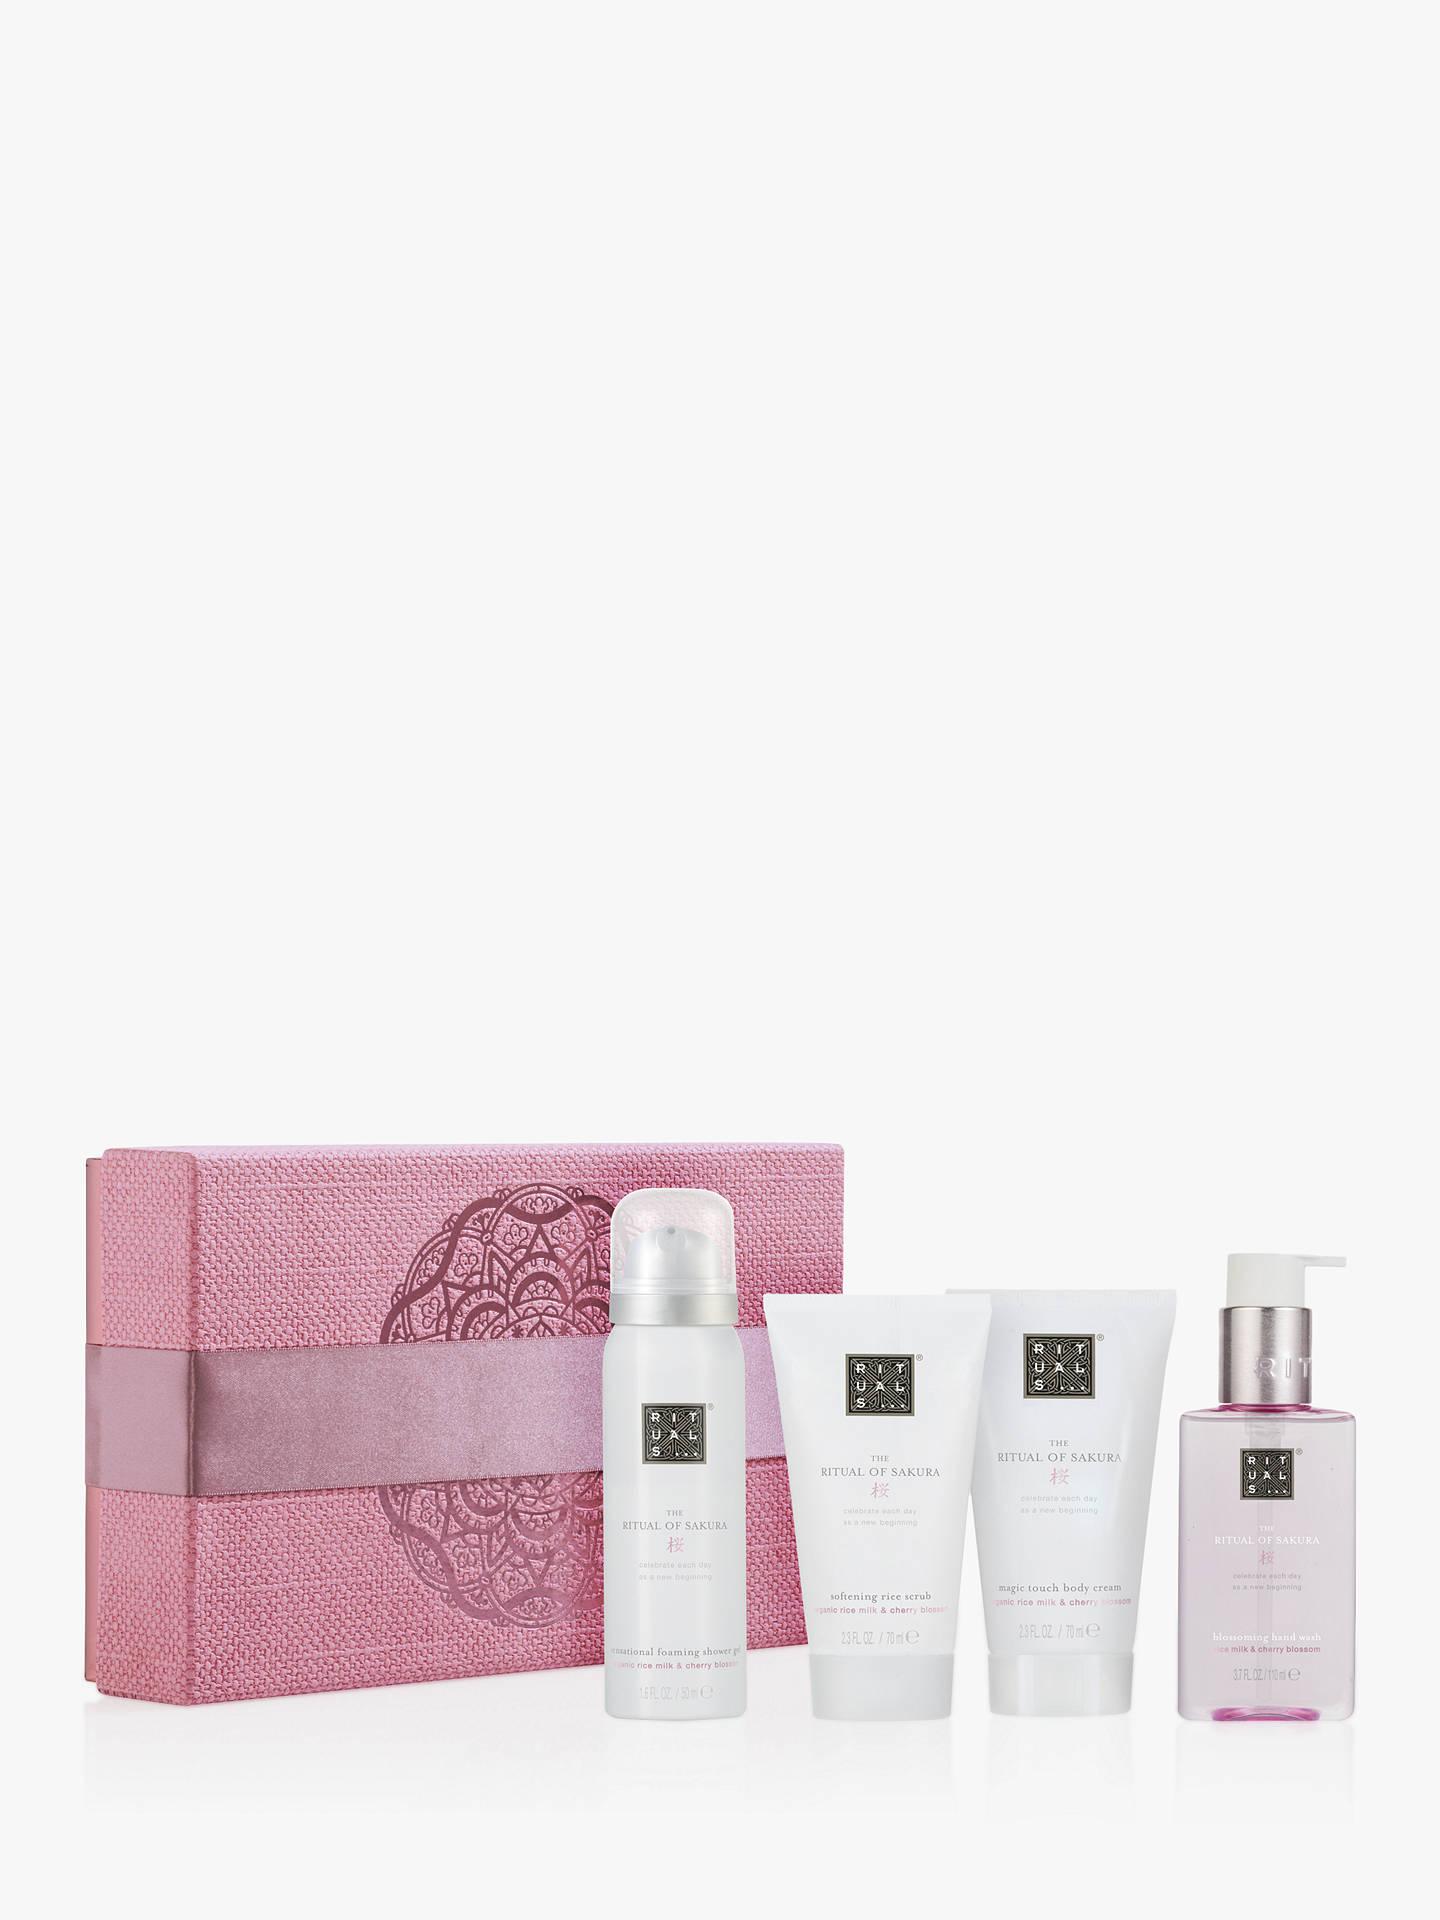 2cf05e7b6610 Buy Rituals The Ritual of Sakura - Renewing Treat Small Body Care Gift Set  Online at